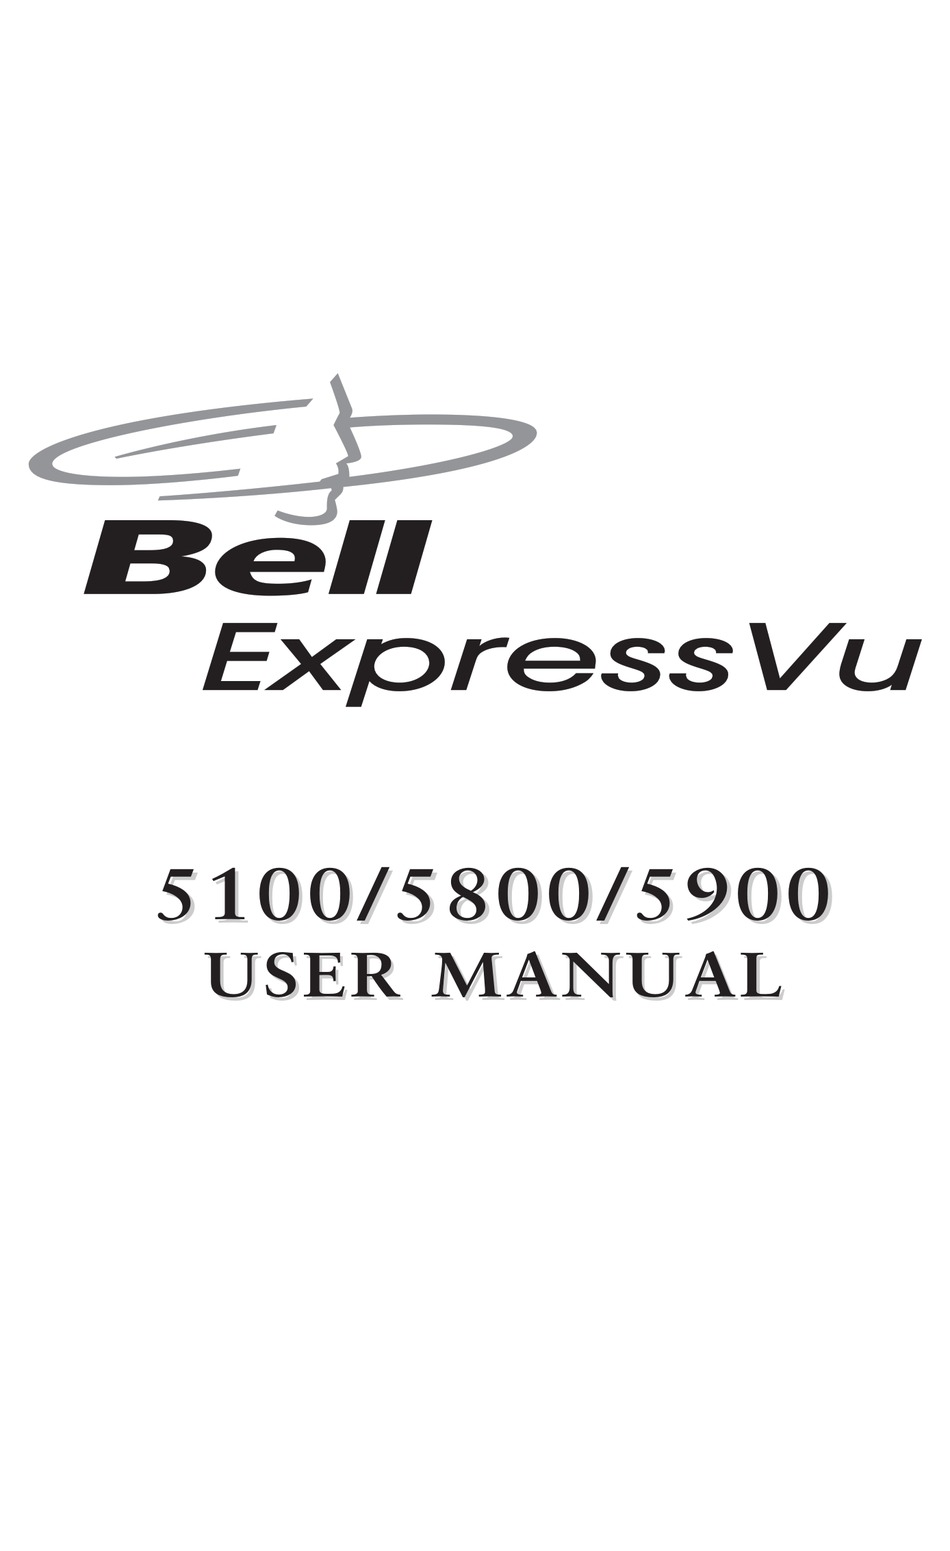 Bell Expressvu 5900 User Manual Pdf